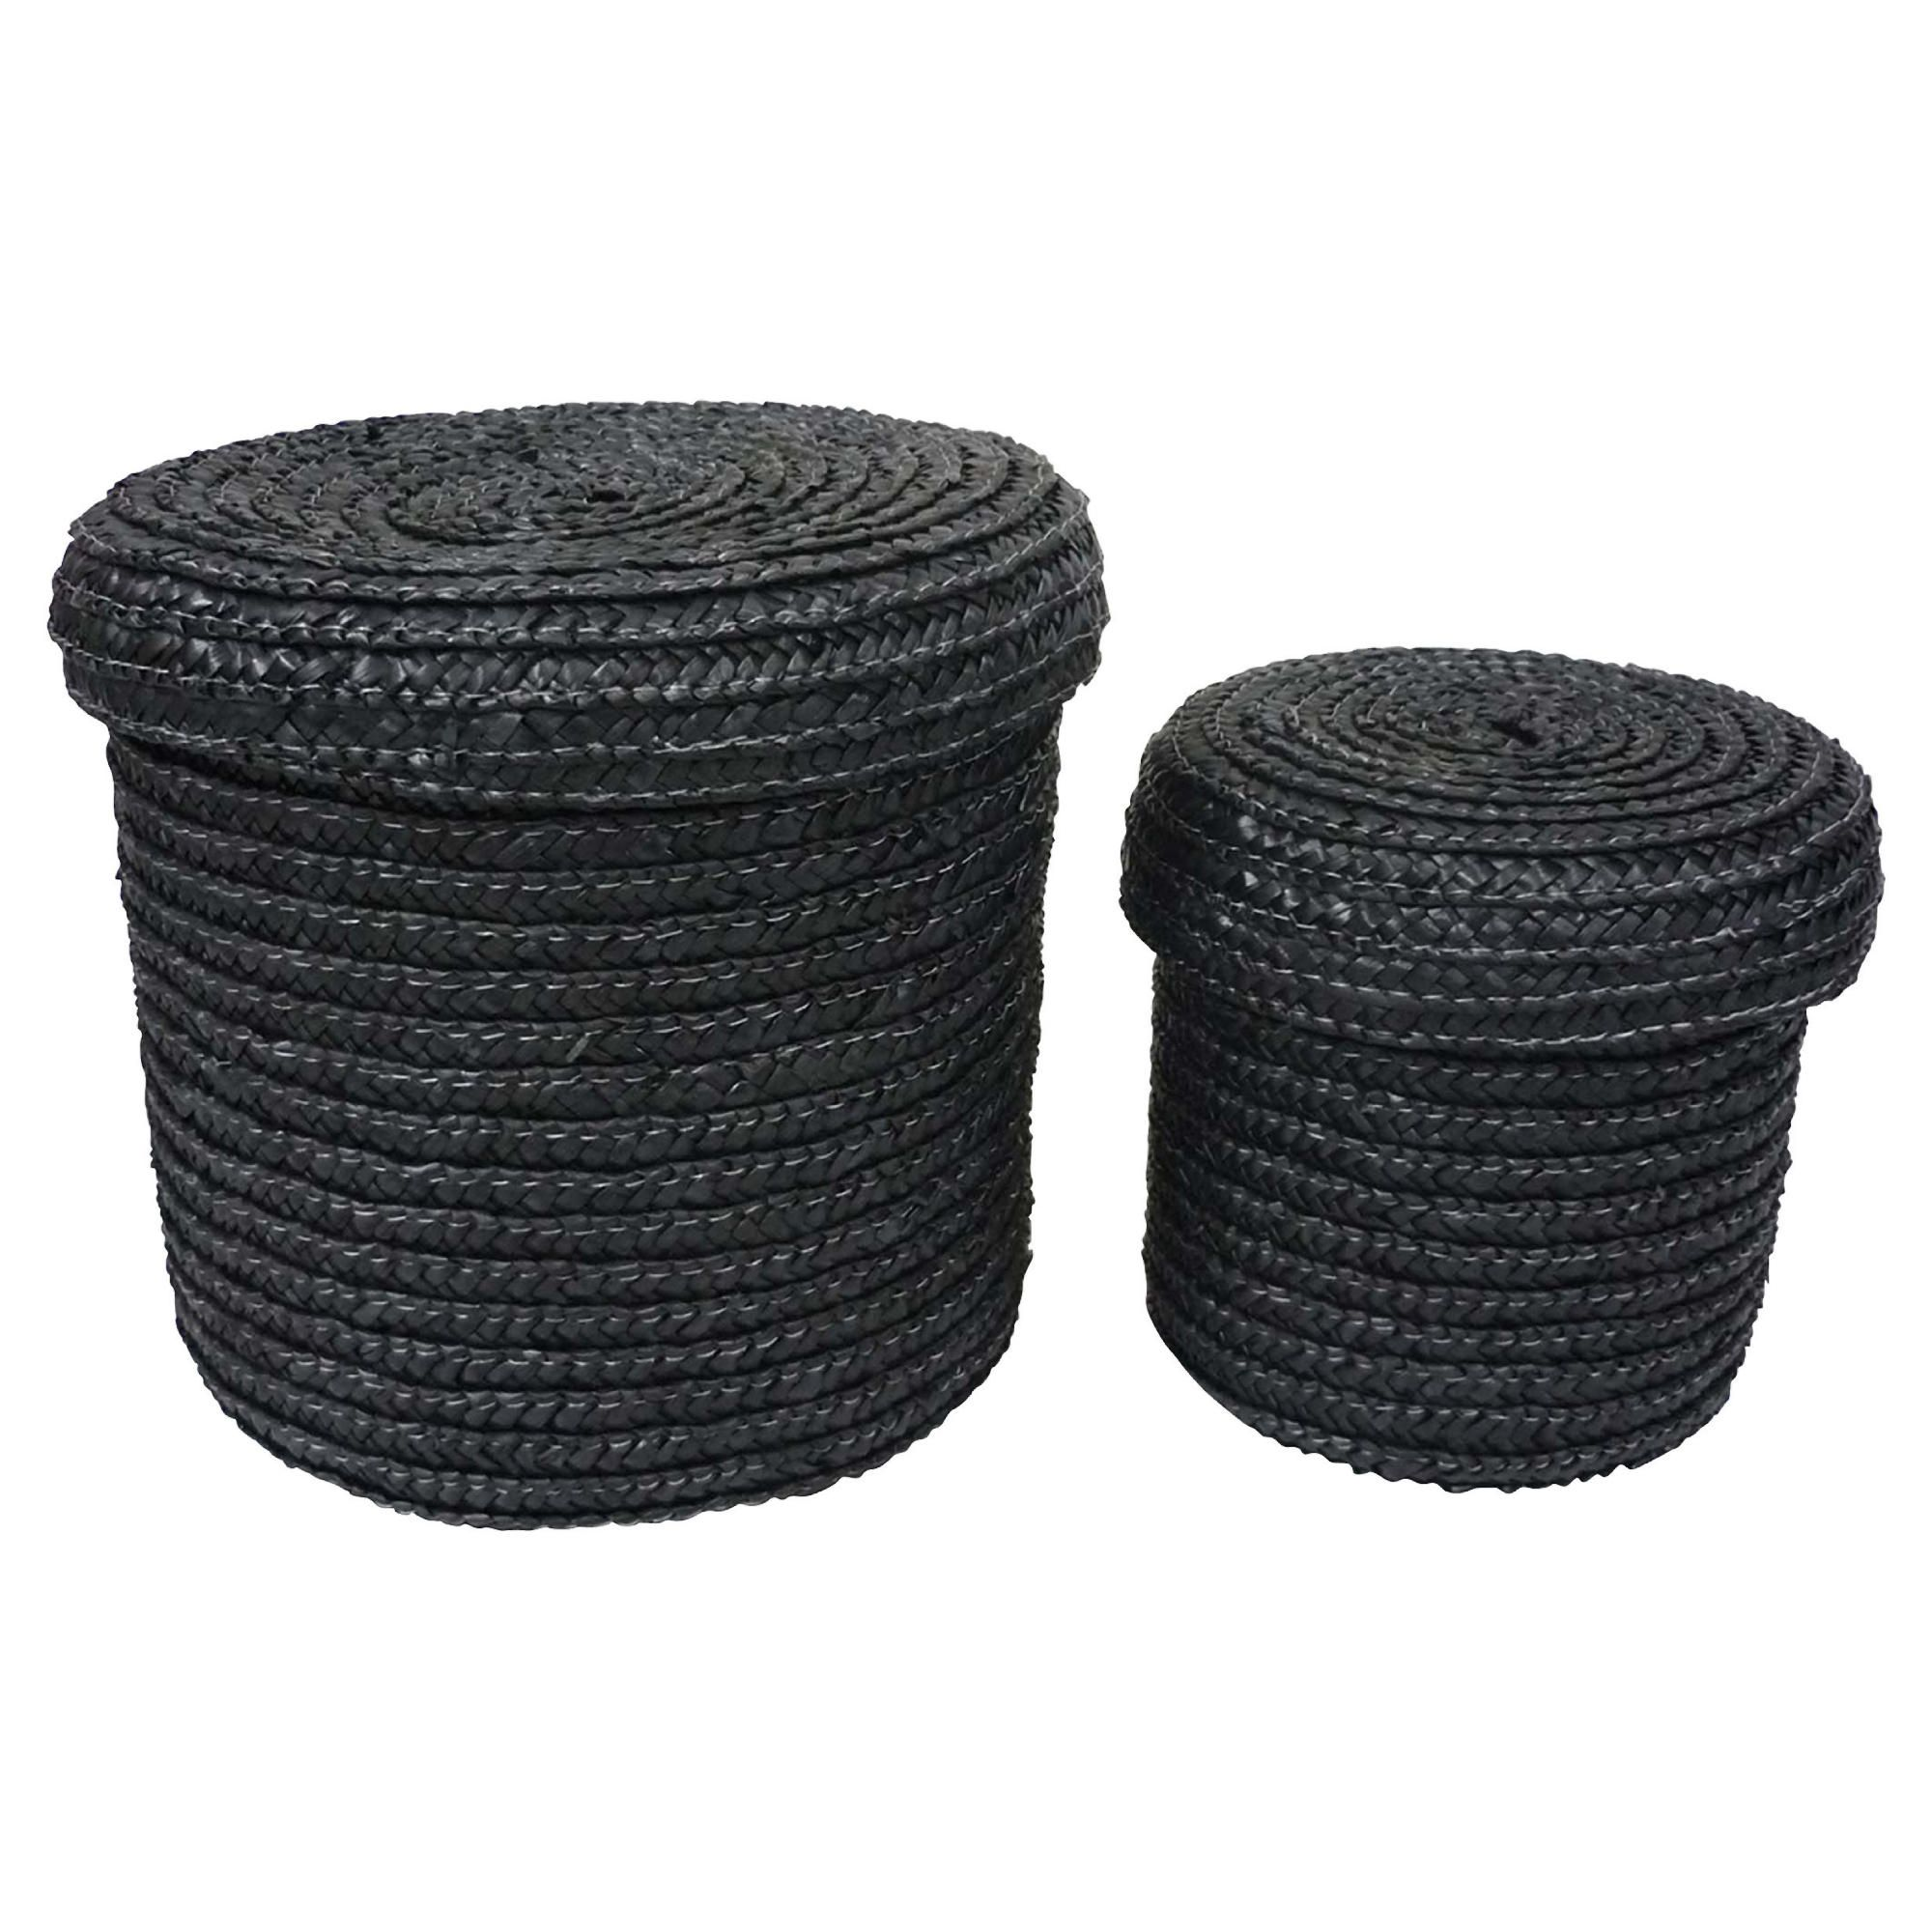 Tesco Set of 2 Straw Storage Baskets Black